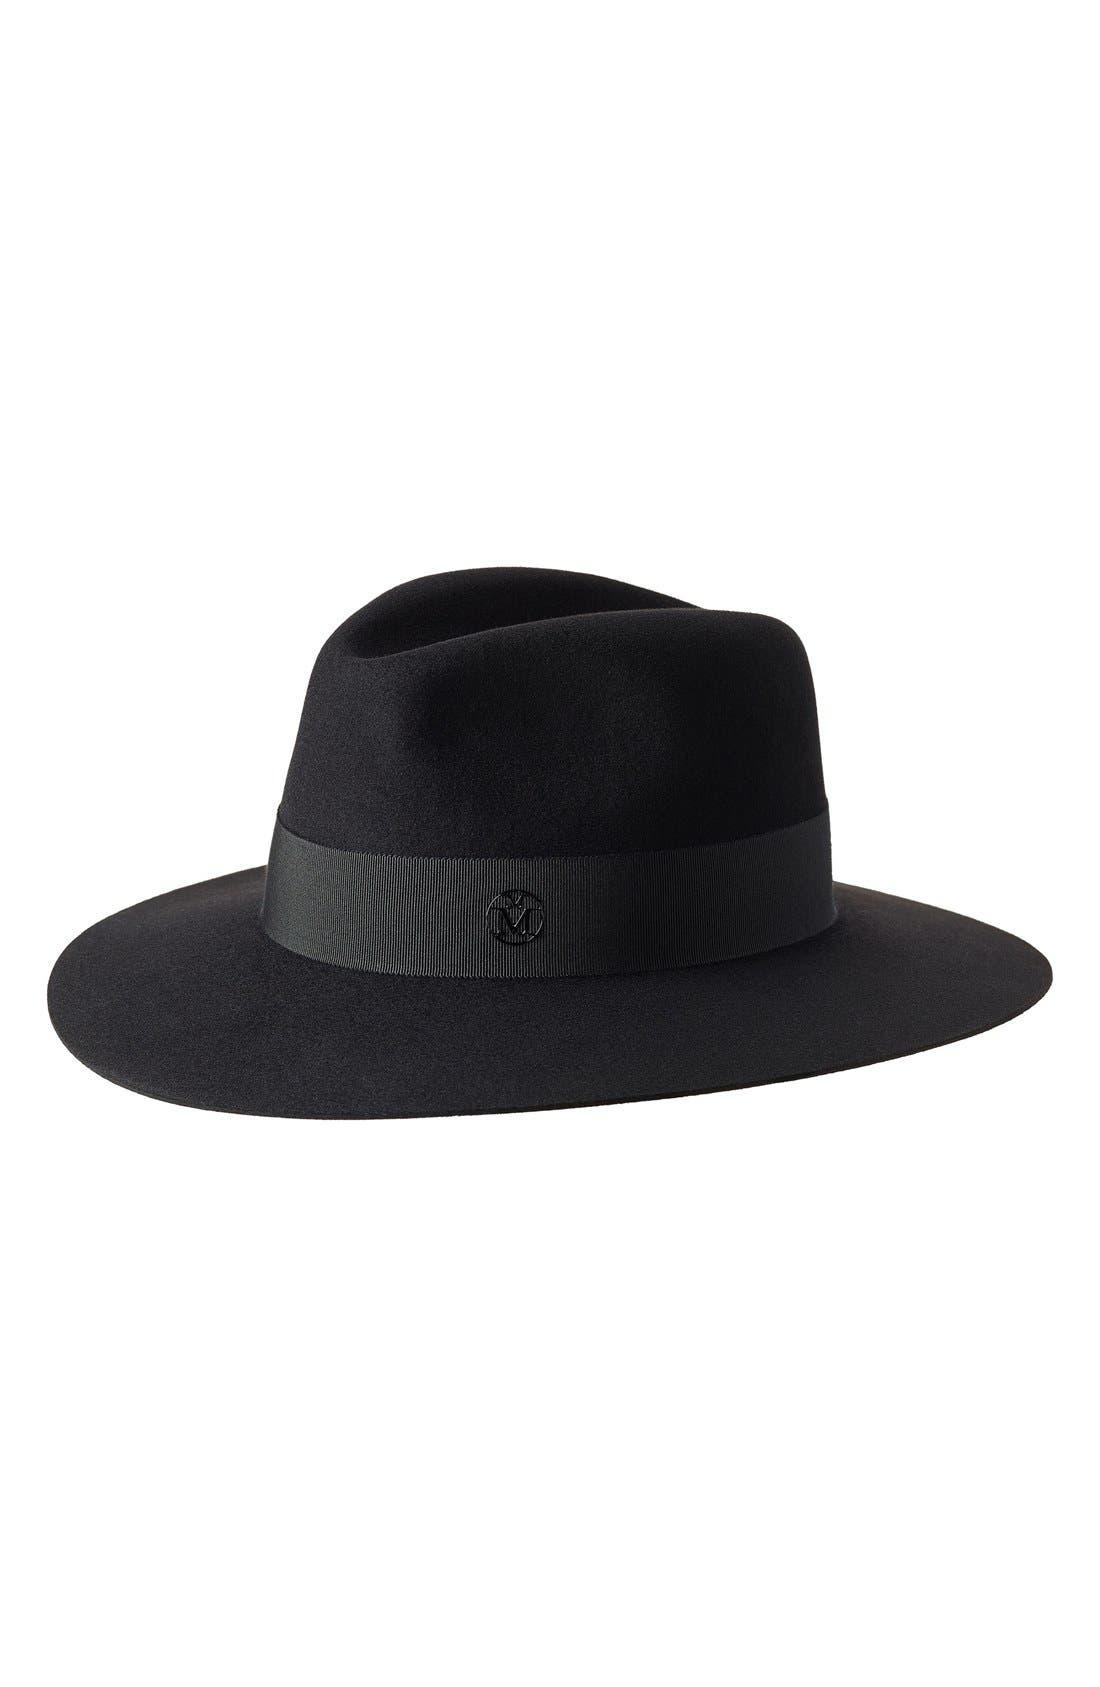 Henrietta Fur Felt Hat,                         Main,                         color, 001